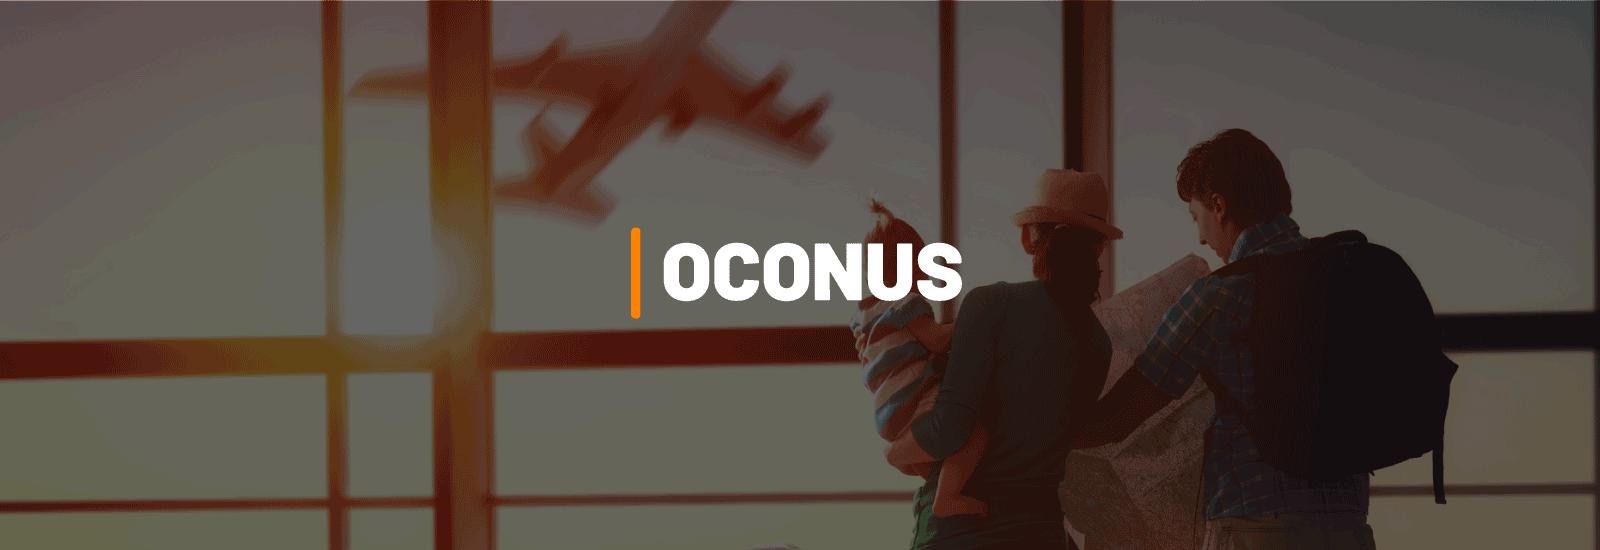 What is OCONUS?